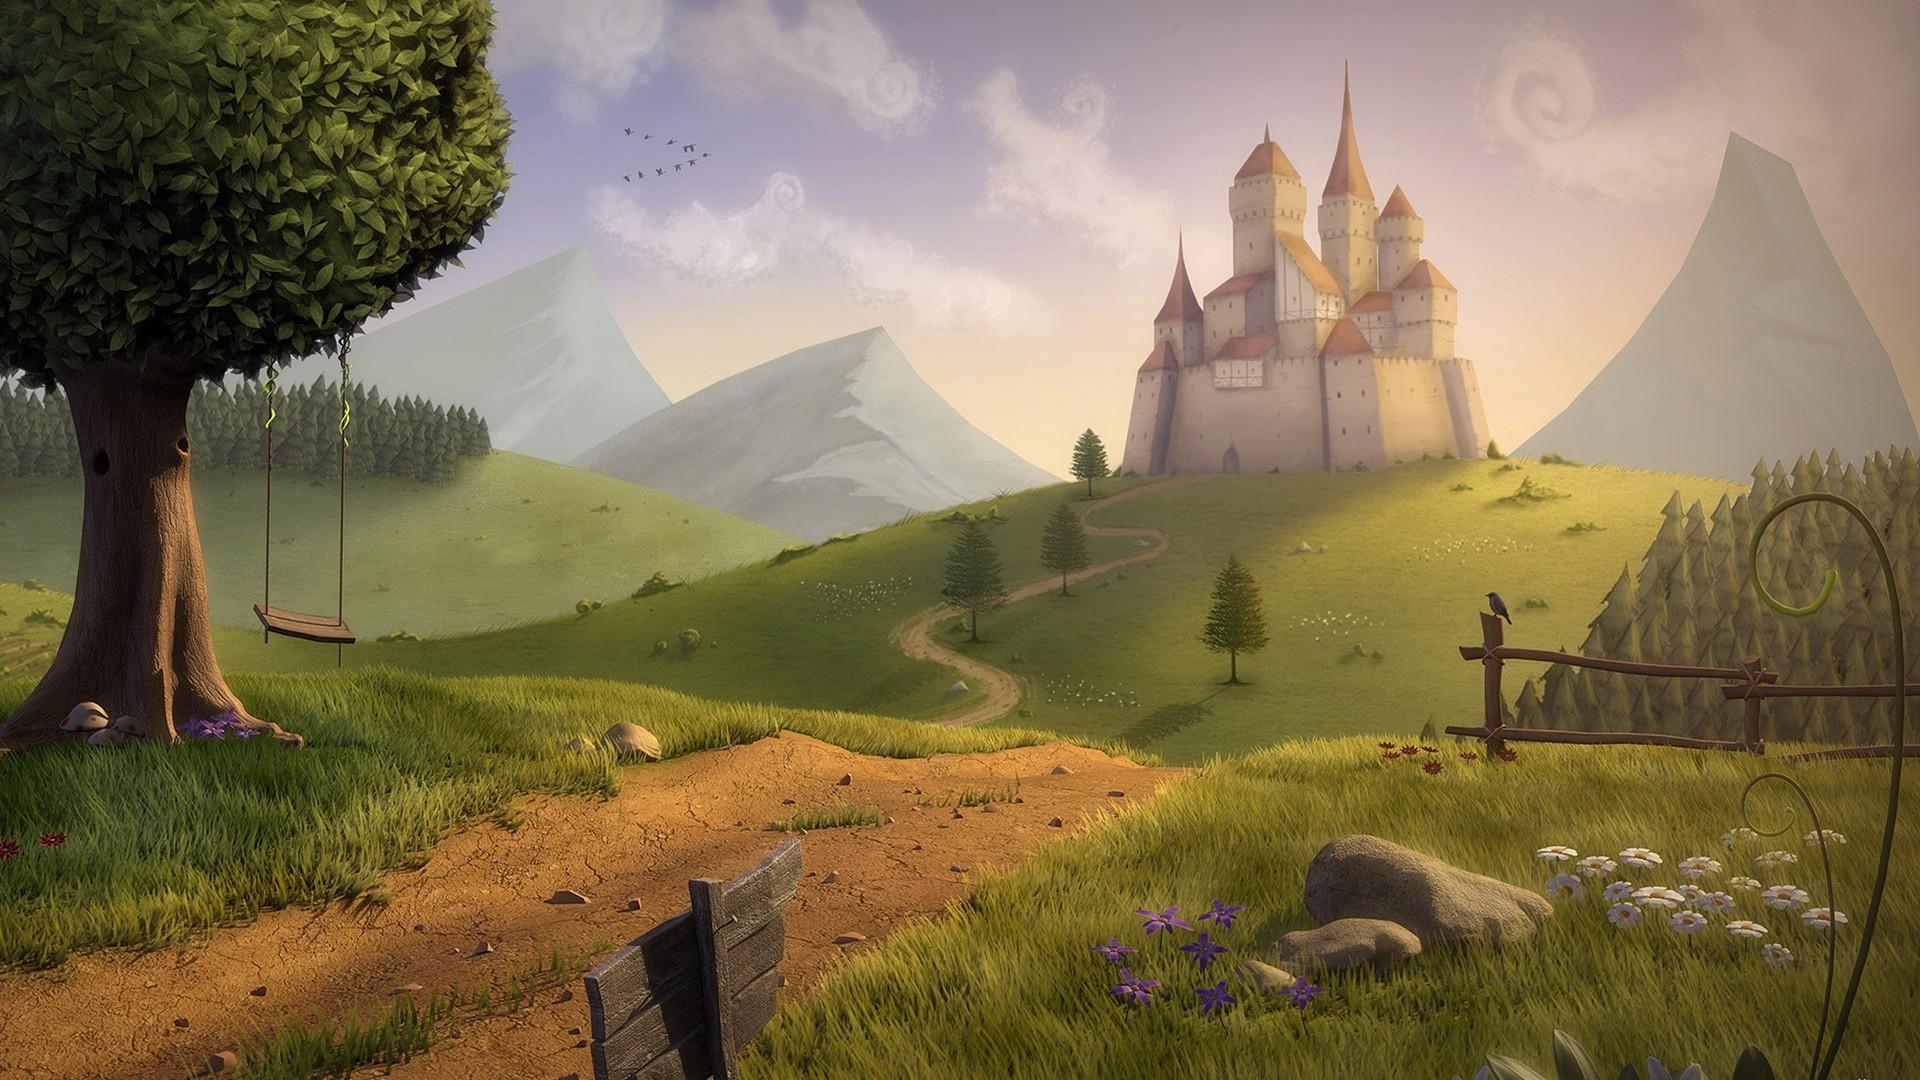 Fantasy Castle Wallpaper Widescreen HD